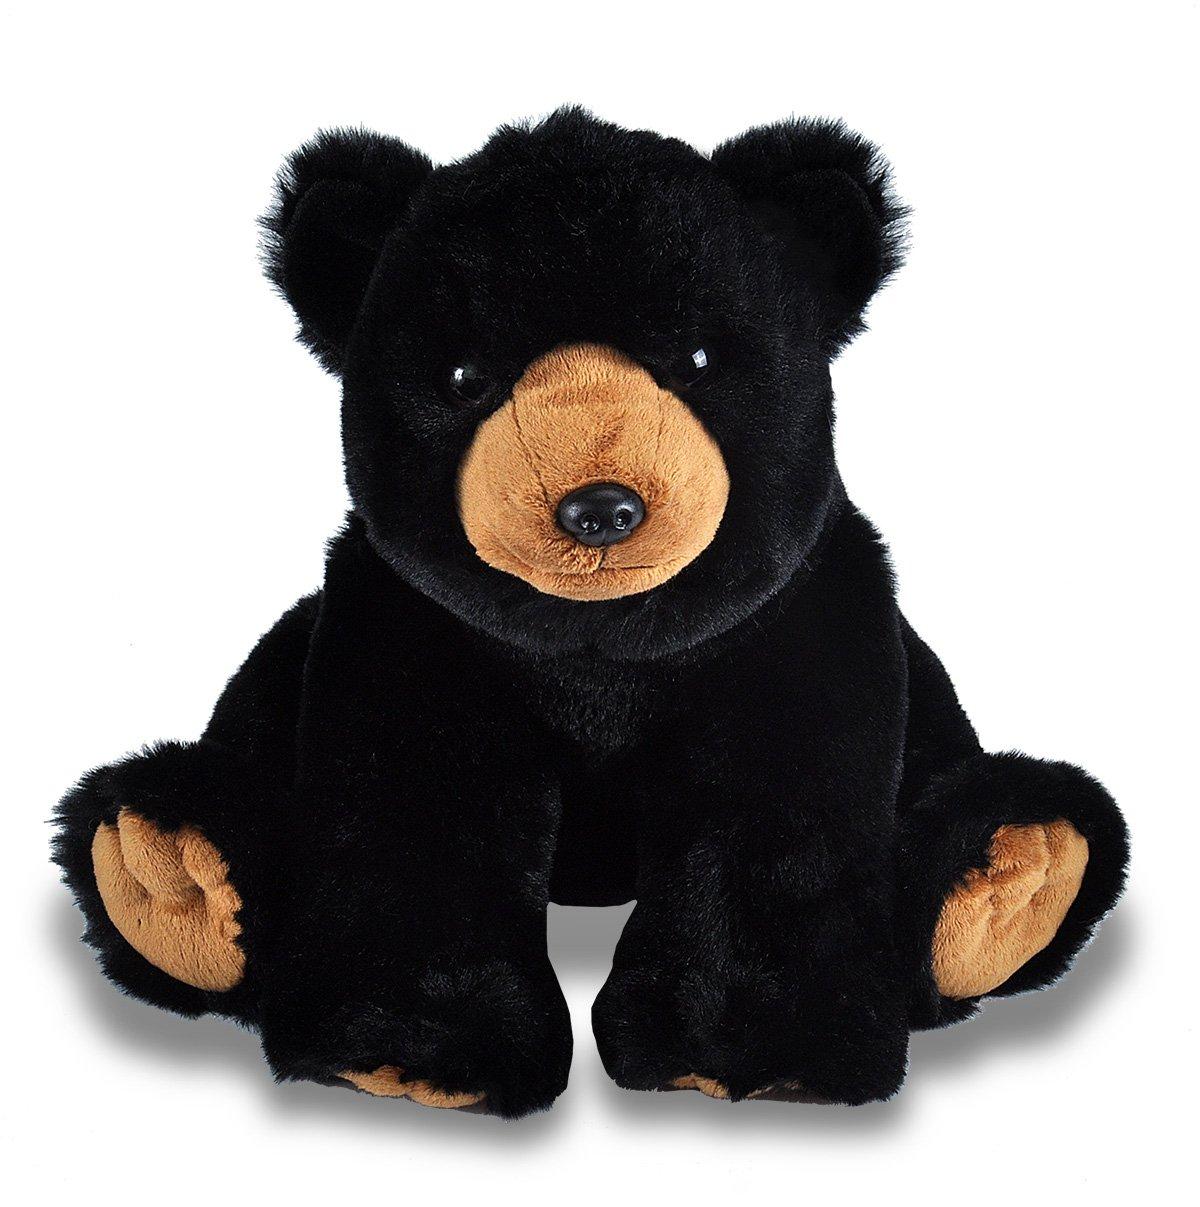 Sunbear Stuffed Animal, Black Bear Plush Rocky Mountain Conservancy